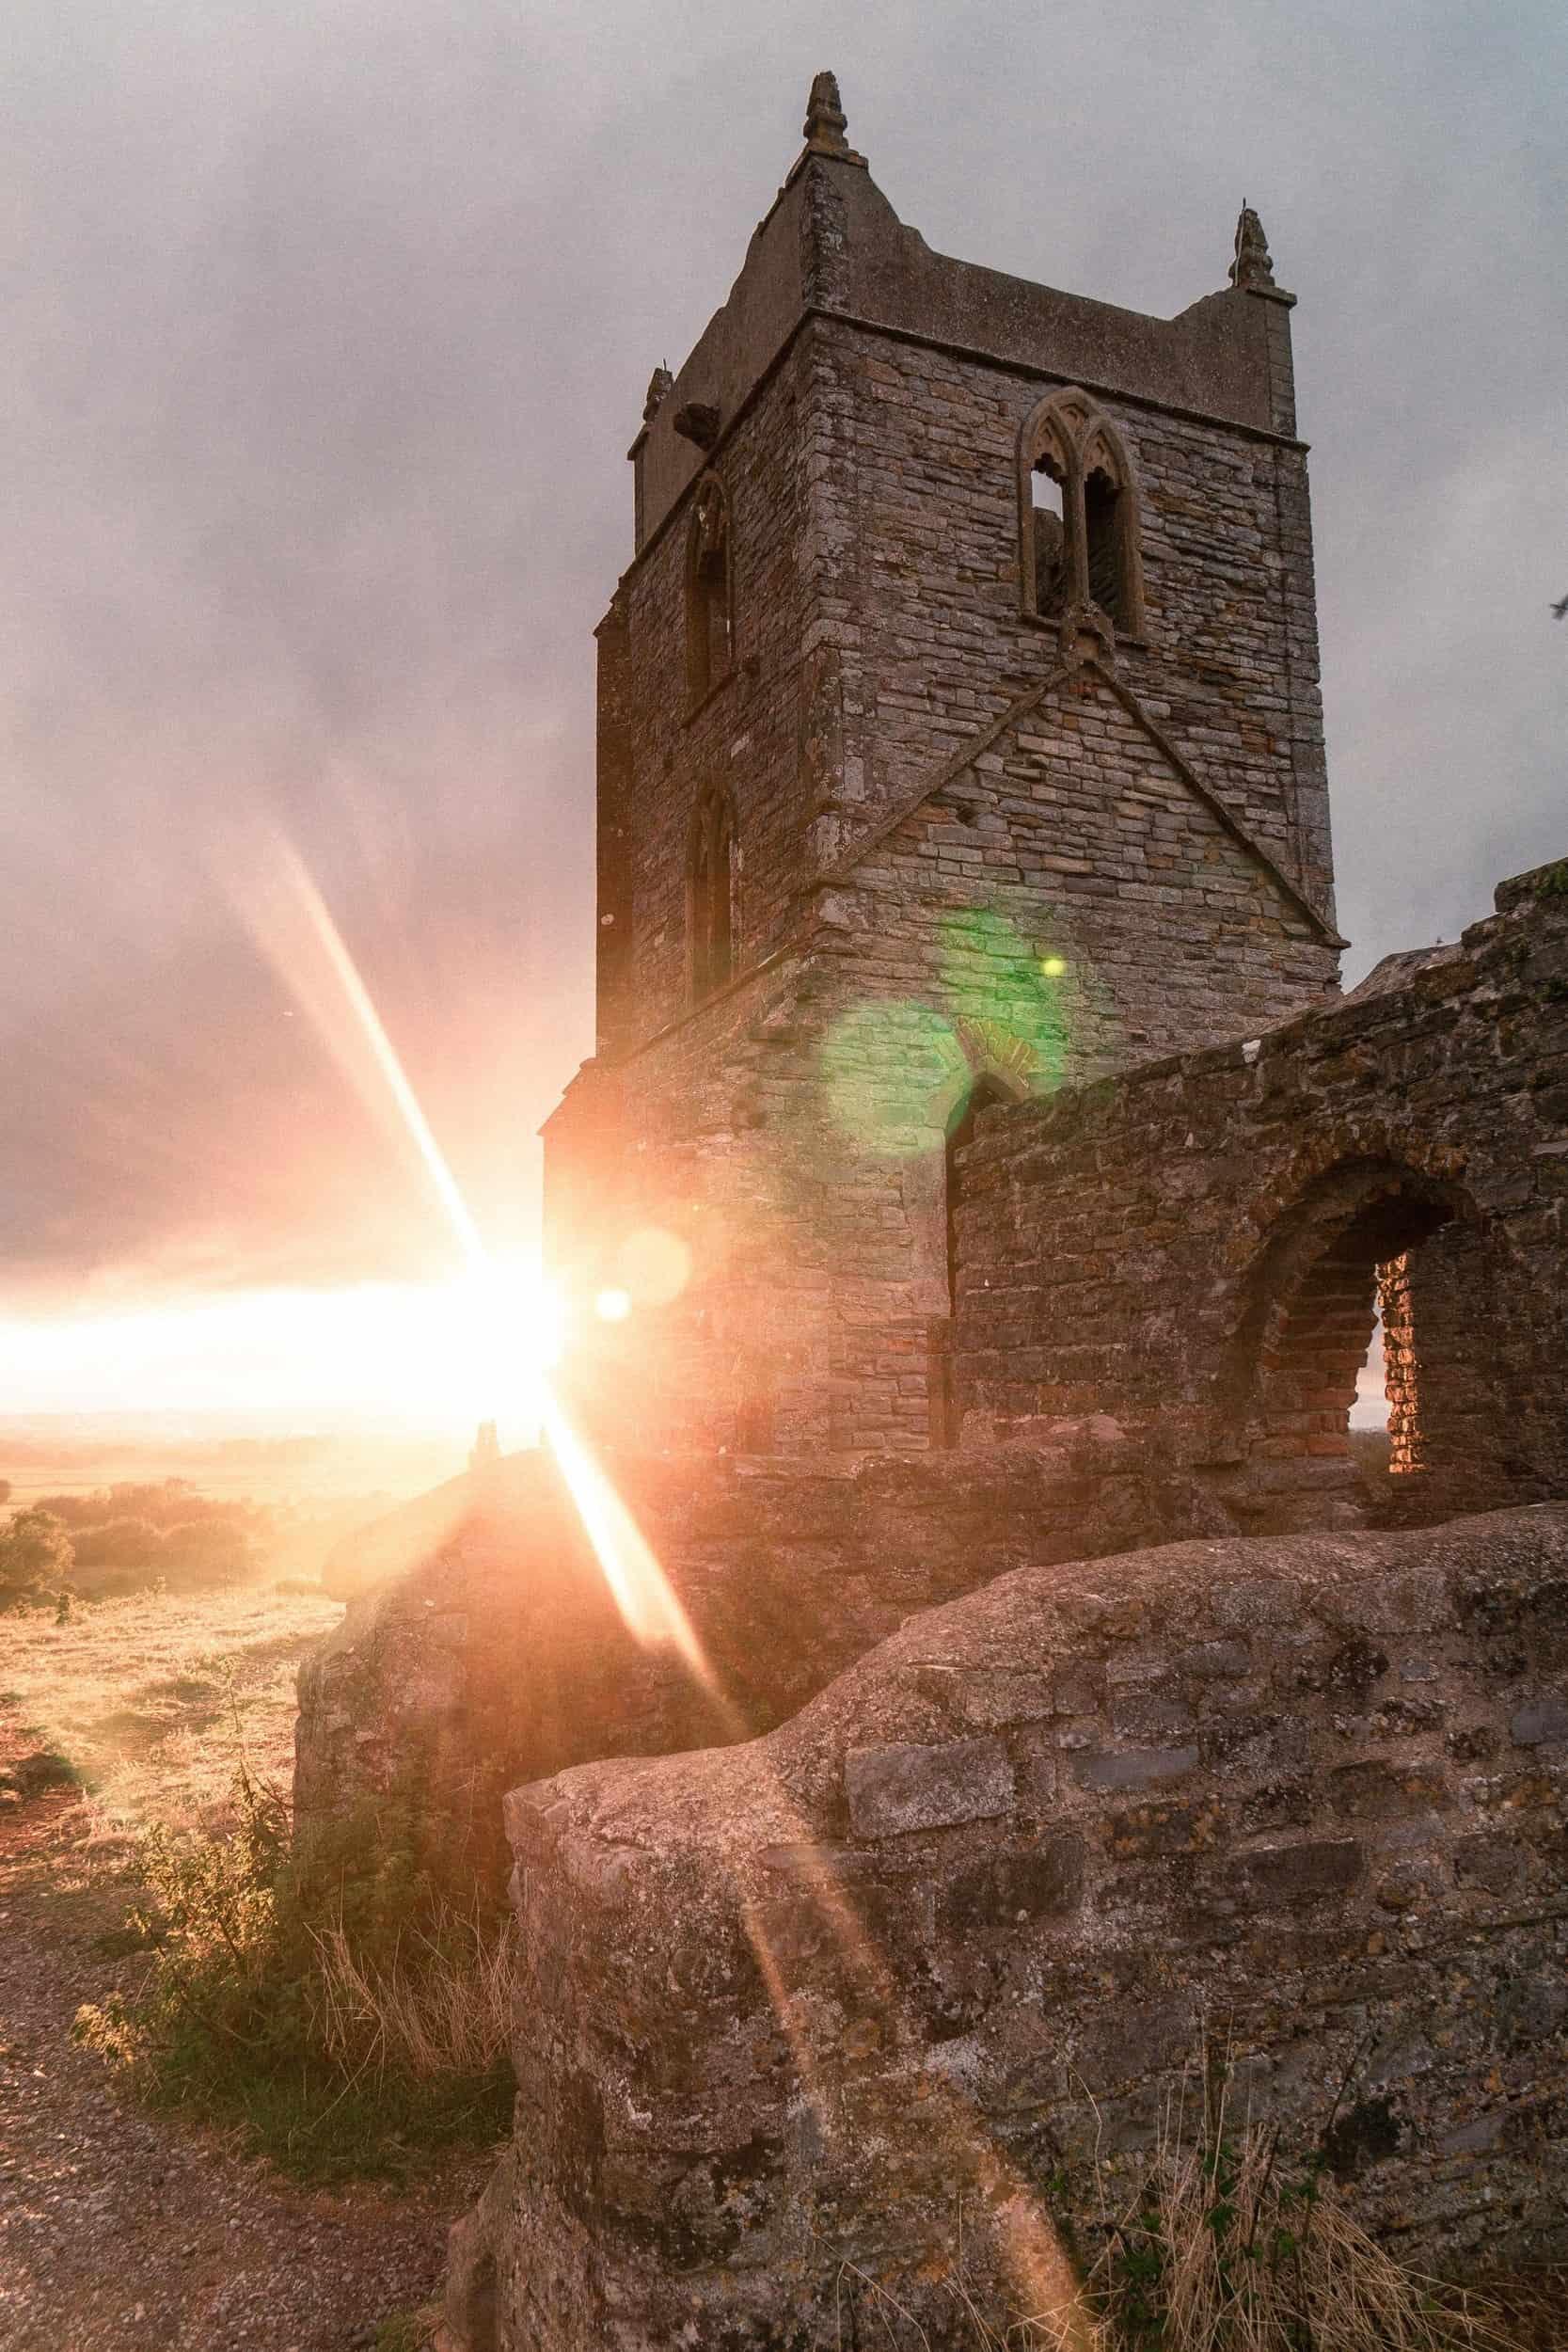 Burrow Mump: The 'Hill Hill' Church Ruins Alternative to Glastonbury Tor, Somerset Levels, Somerset, England